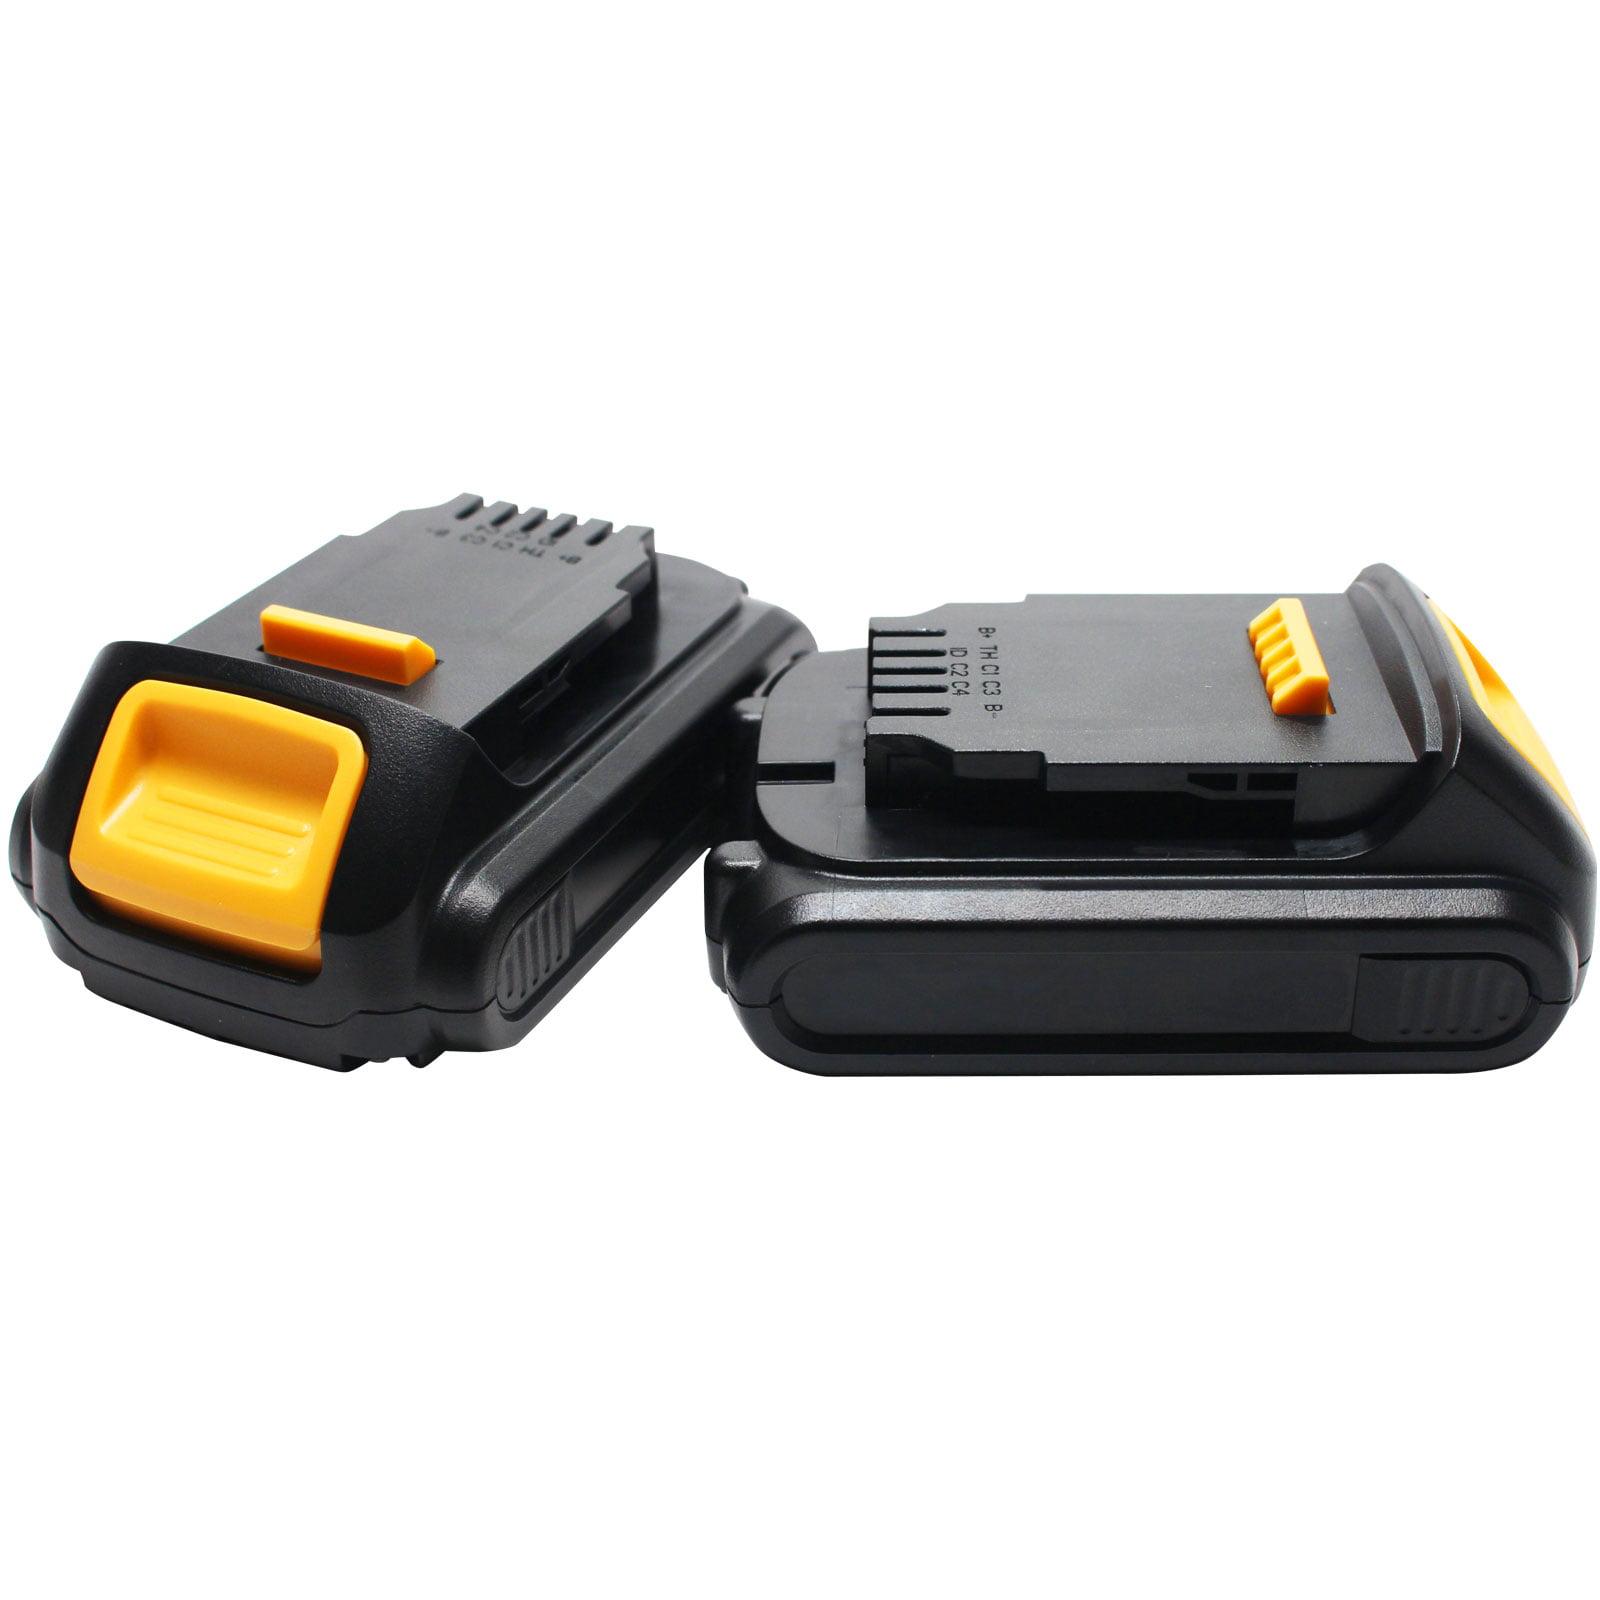 2 Pack Upstart Battery Dewalt Dcs371b Battery Replacement For Dewalt 20v Max Power Tool Battery 1500mah Lithium Ion Walmart Com Walmart Com